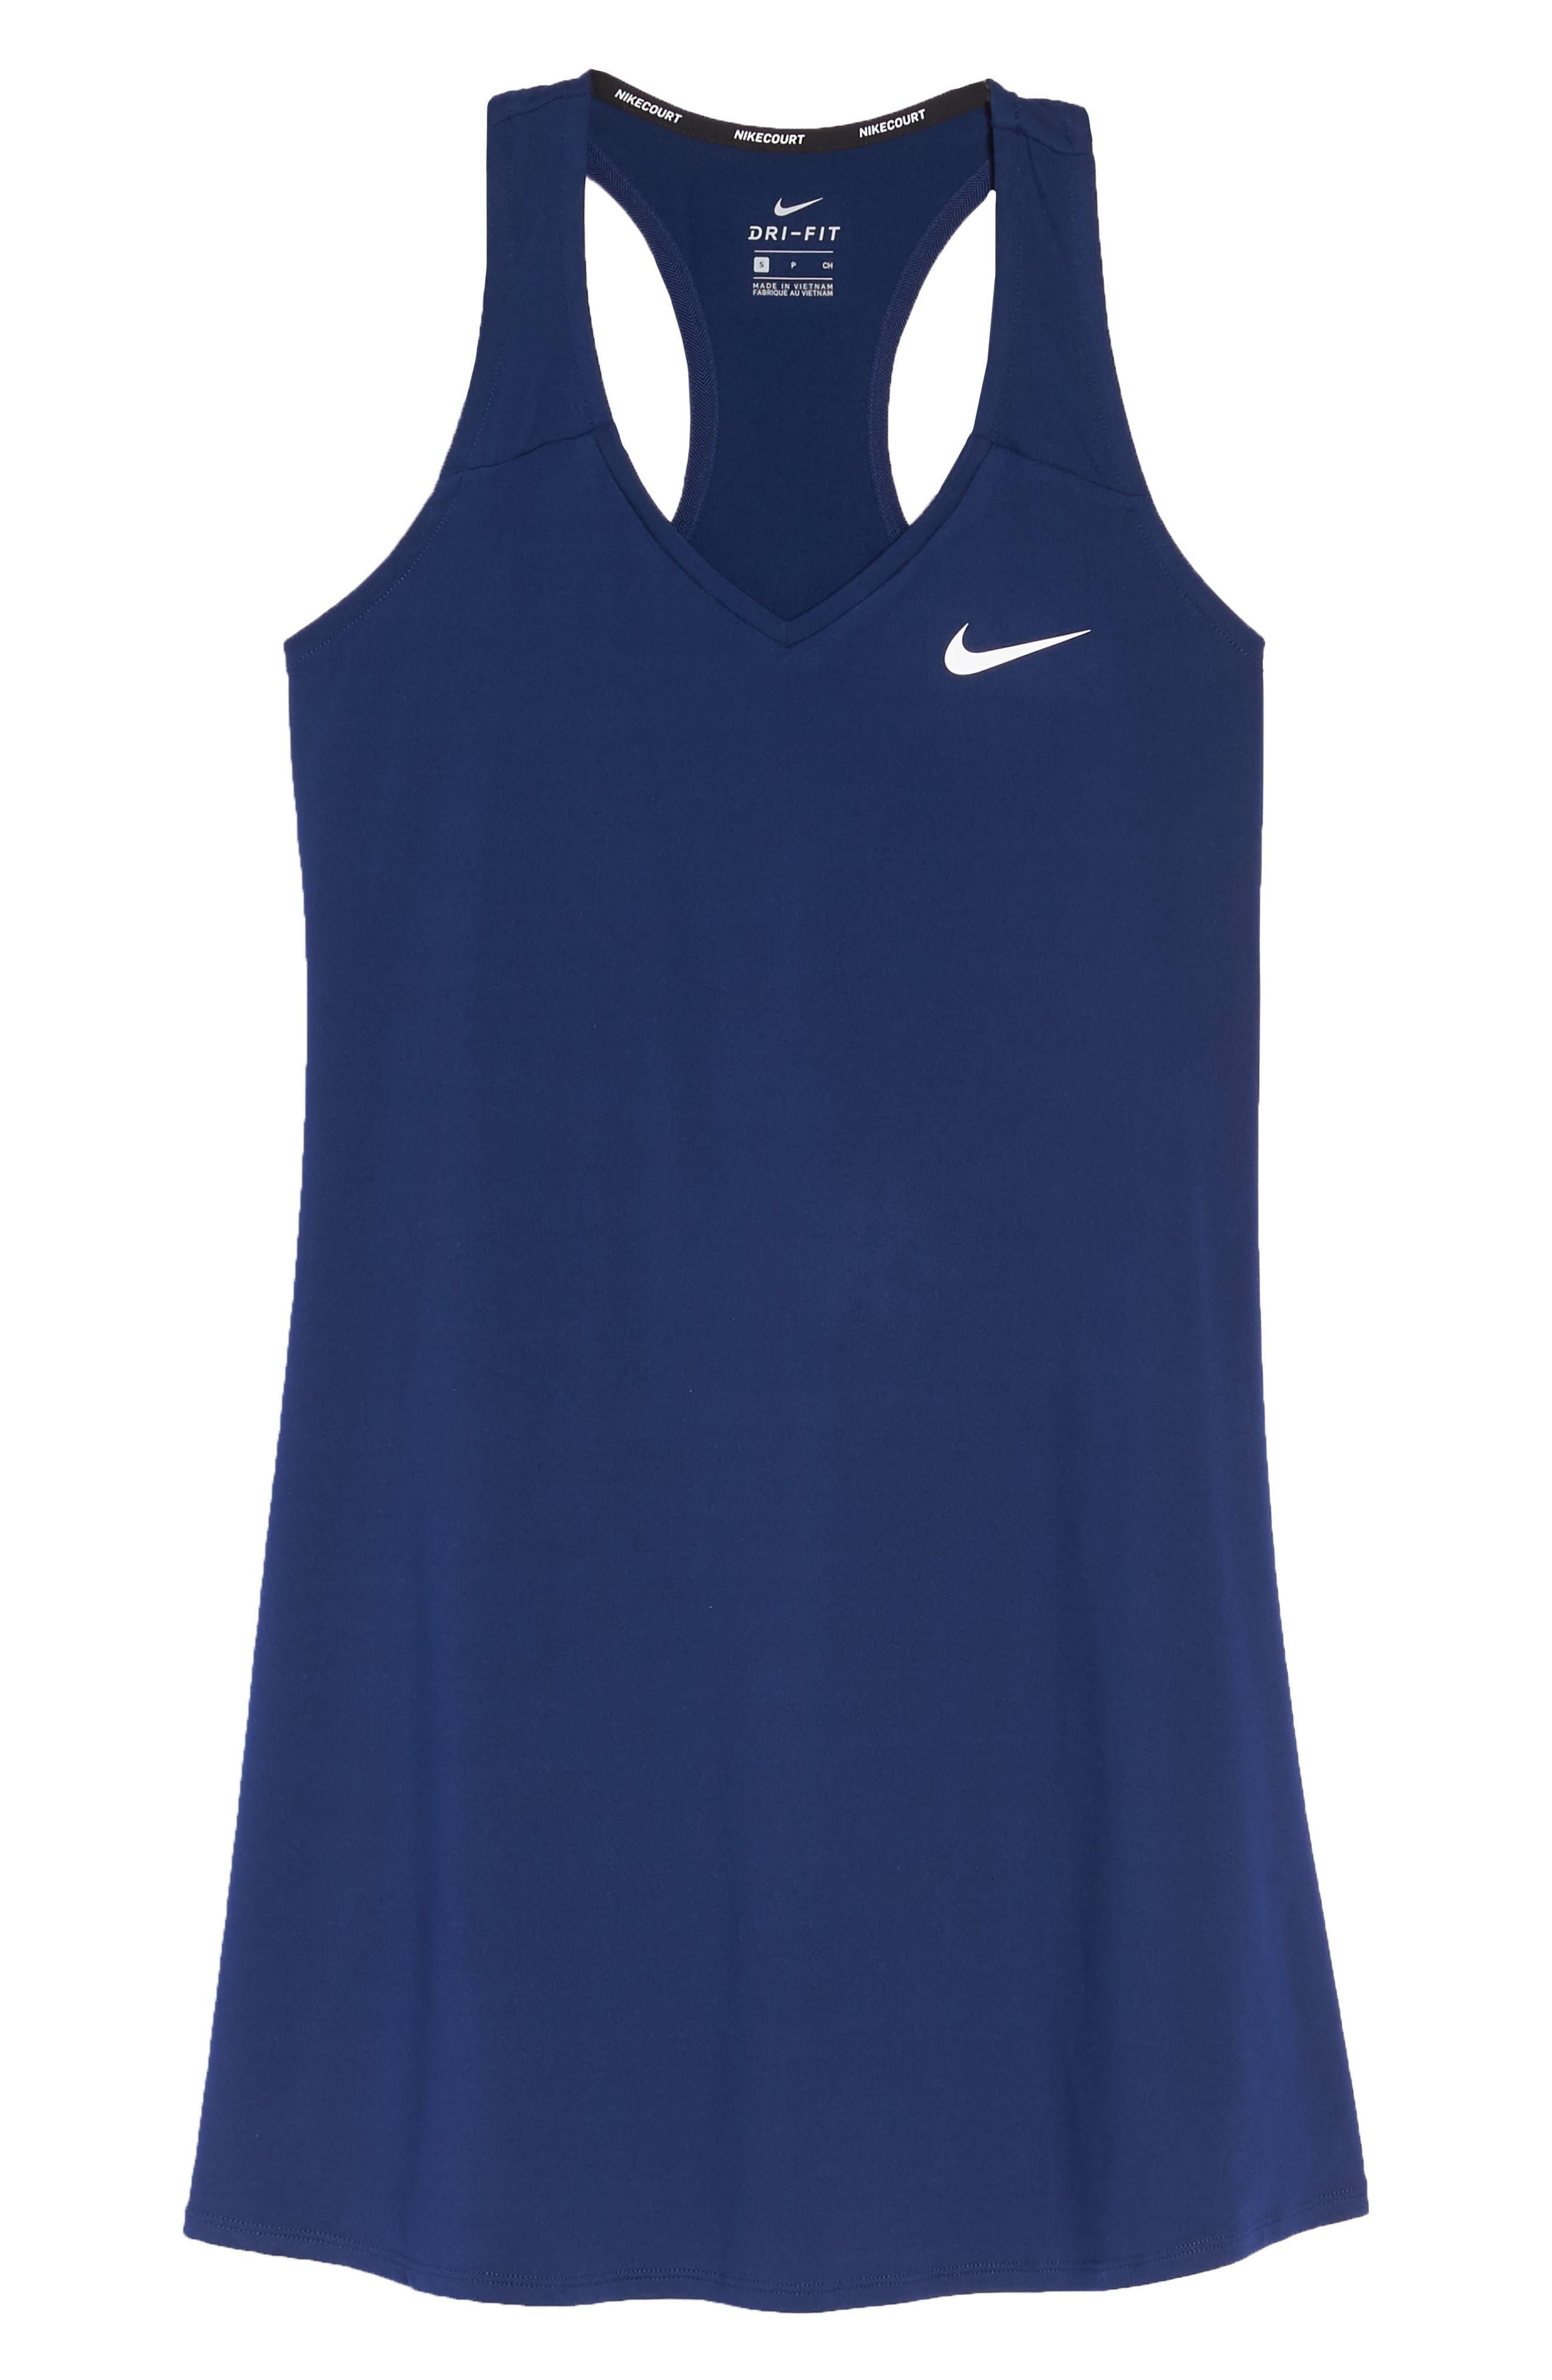 Dri-FIT Tennis Dress,                             Alternate thumbnail 7, color,                             492